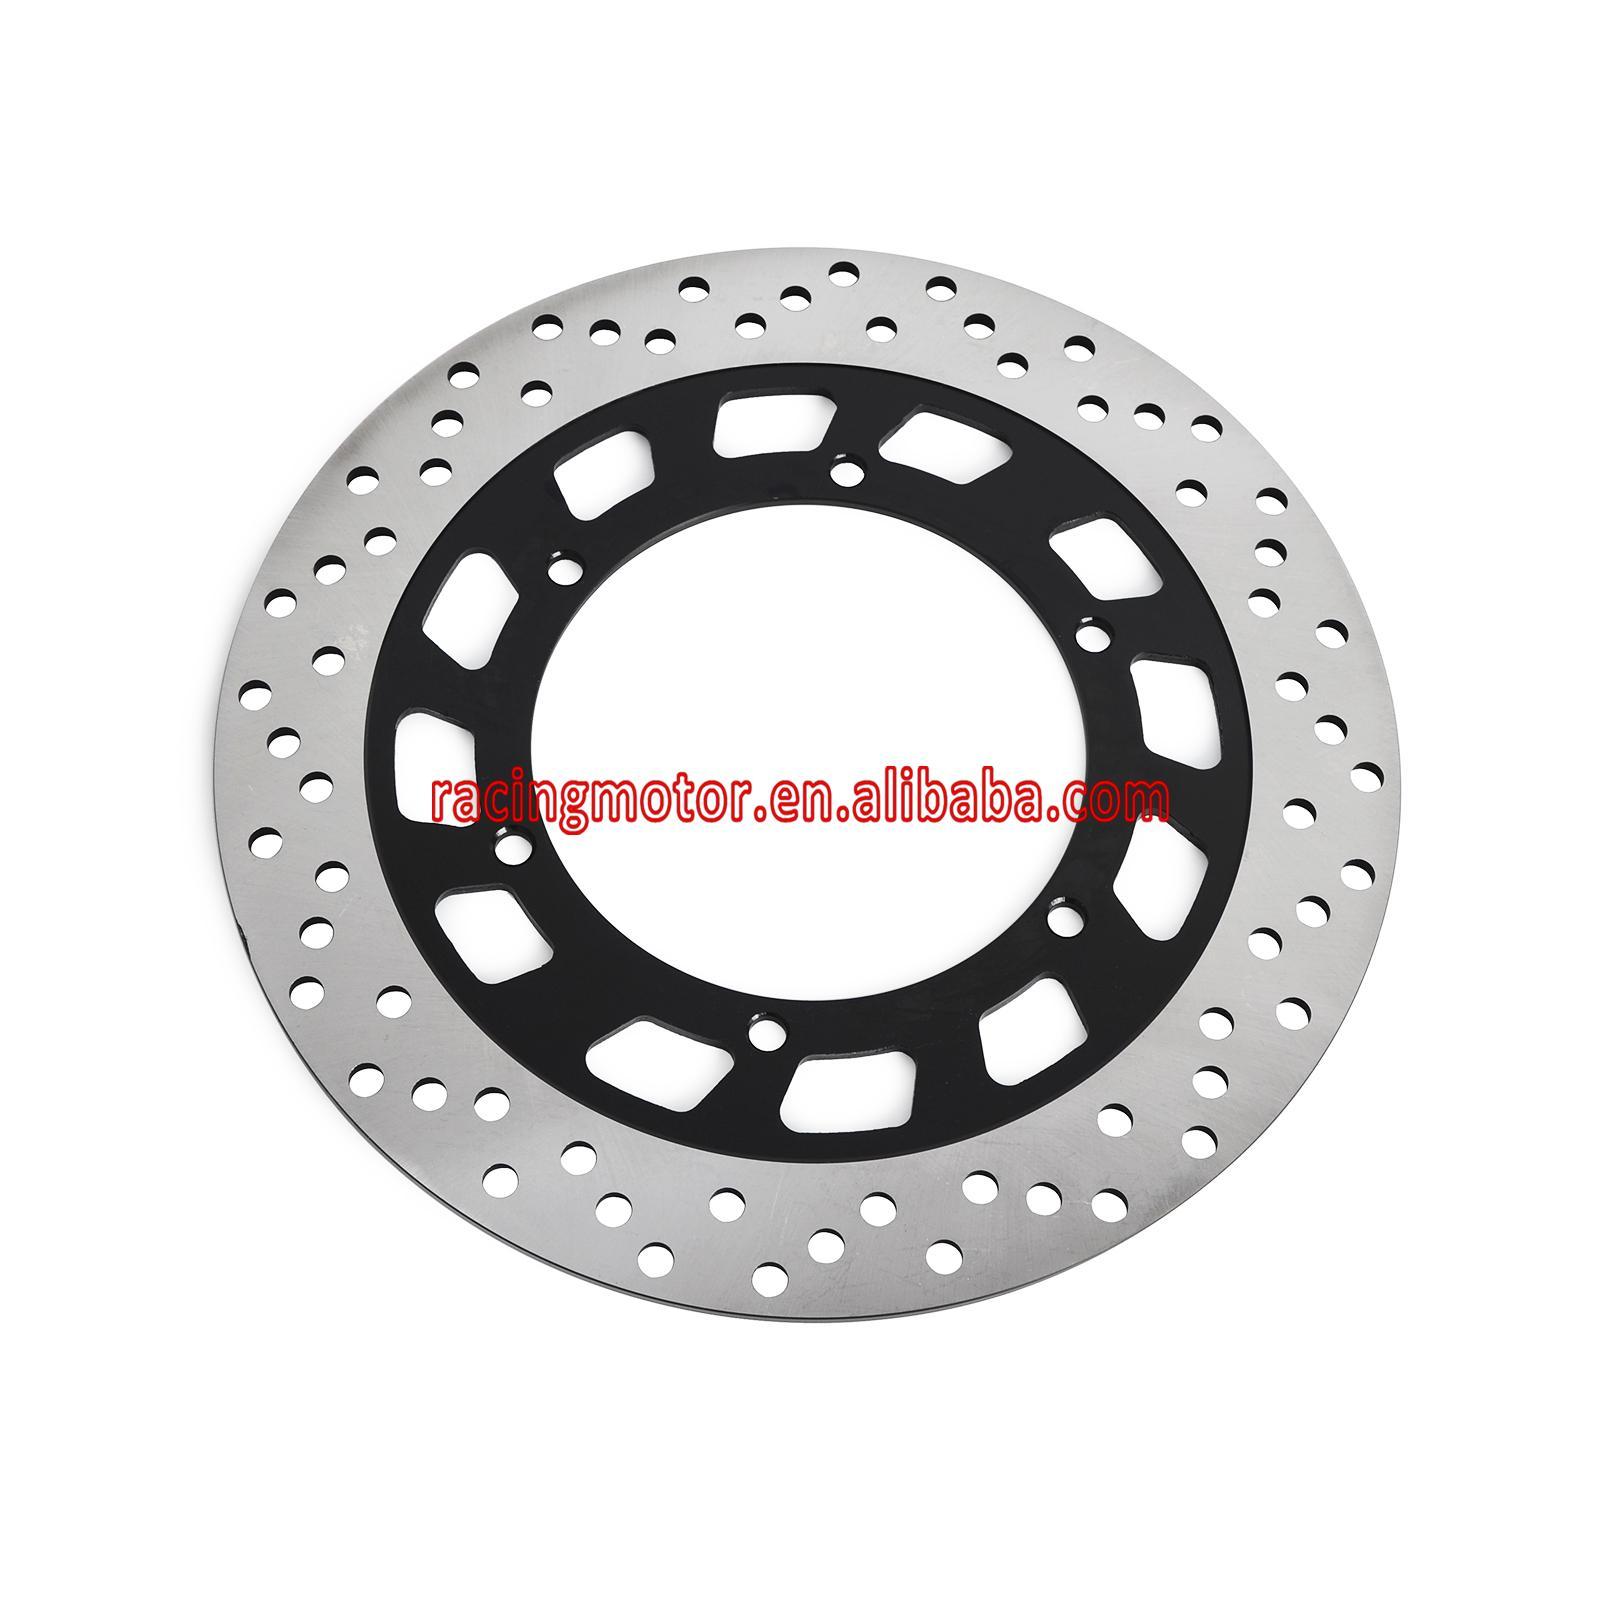 Motorcycle Rear Brake Disc Rotor For Yamaha GTS1000 1993 1996 FJ1100 1984 1985 FJ1200 1986 1995